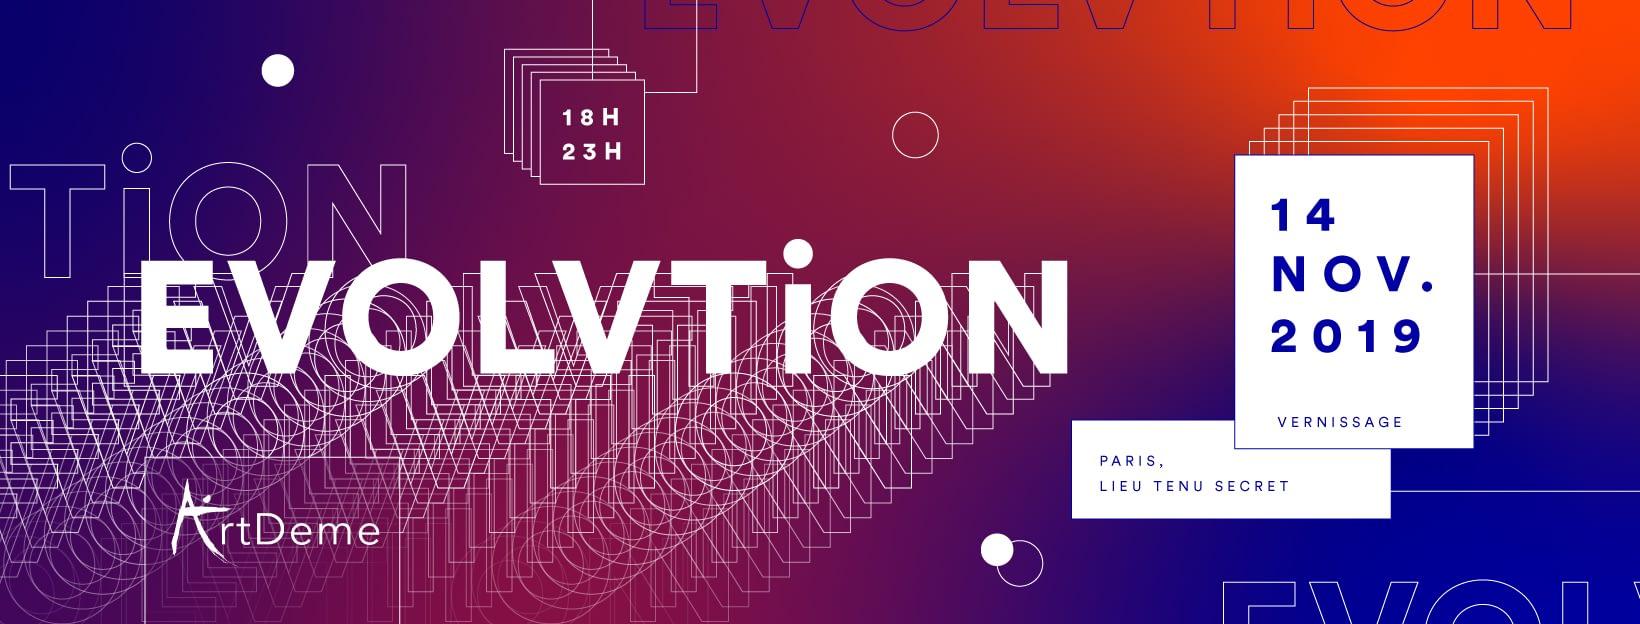 EVOLVTION - Vernissage ArtDeme